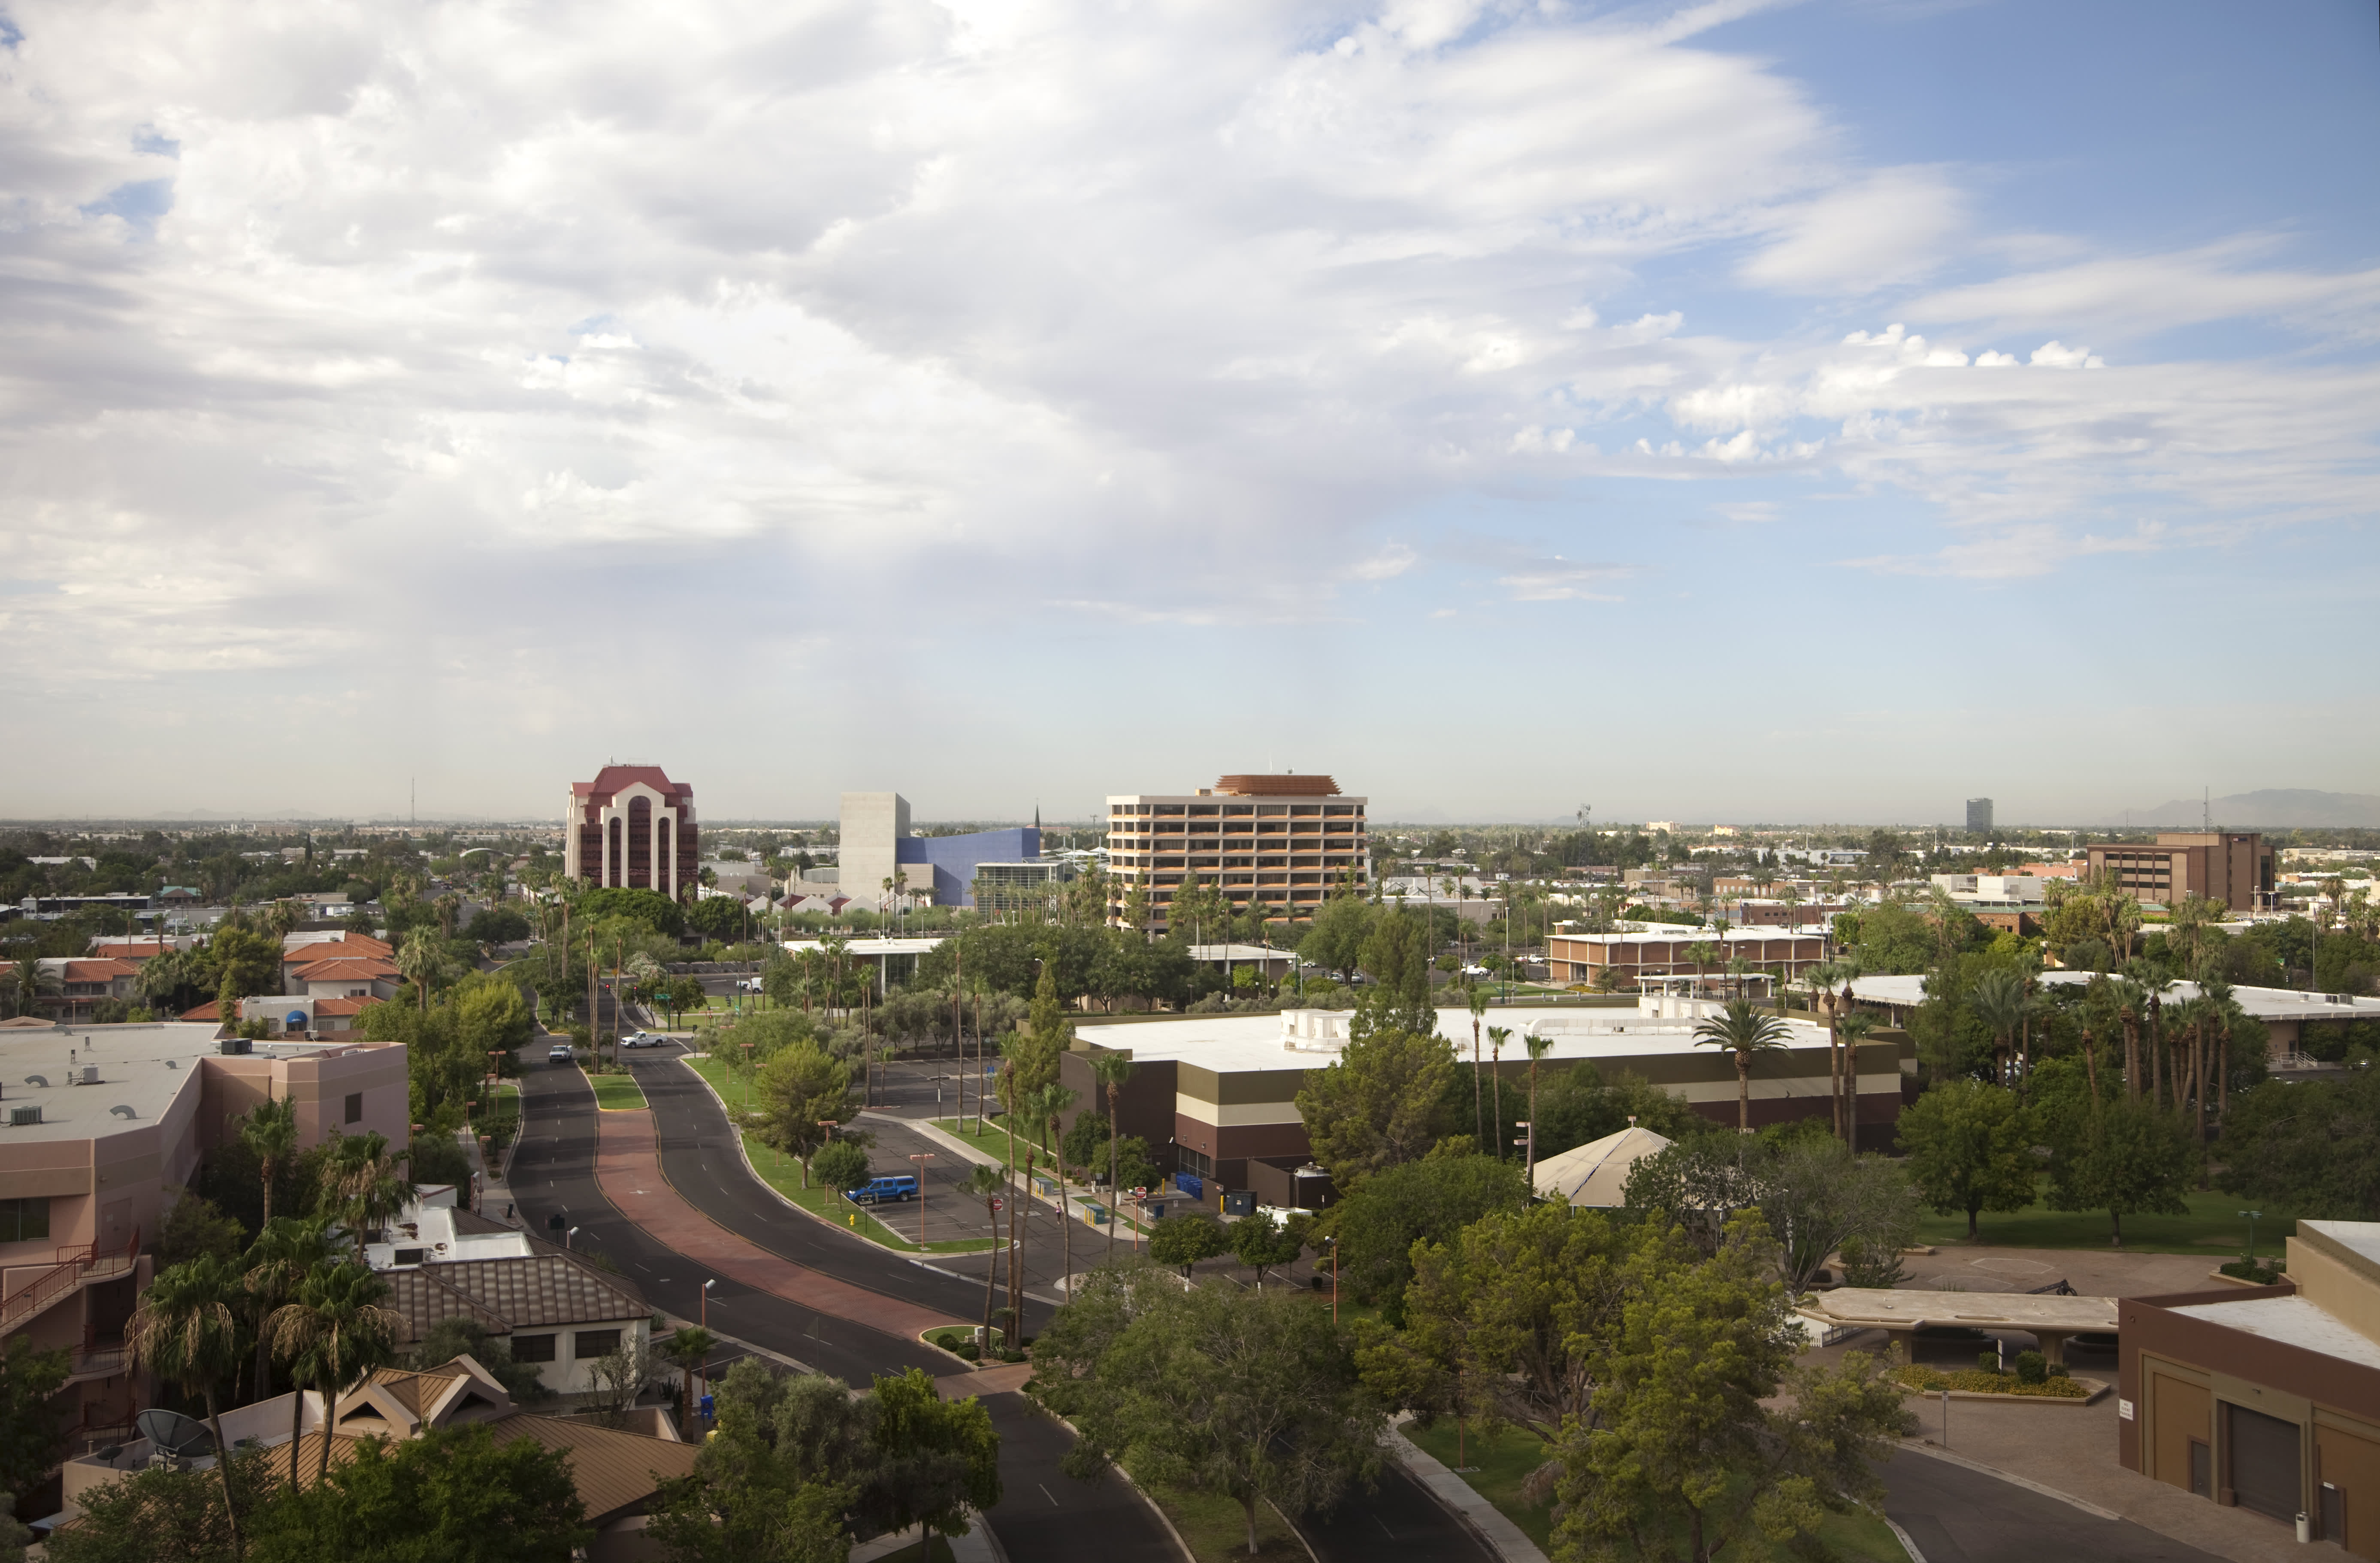 Urban Mesa Arizona Aerial View of City Skyline